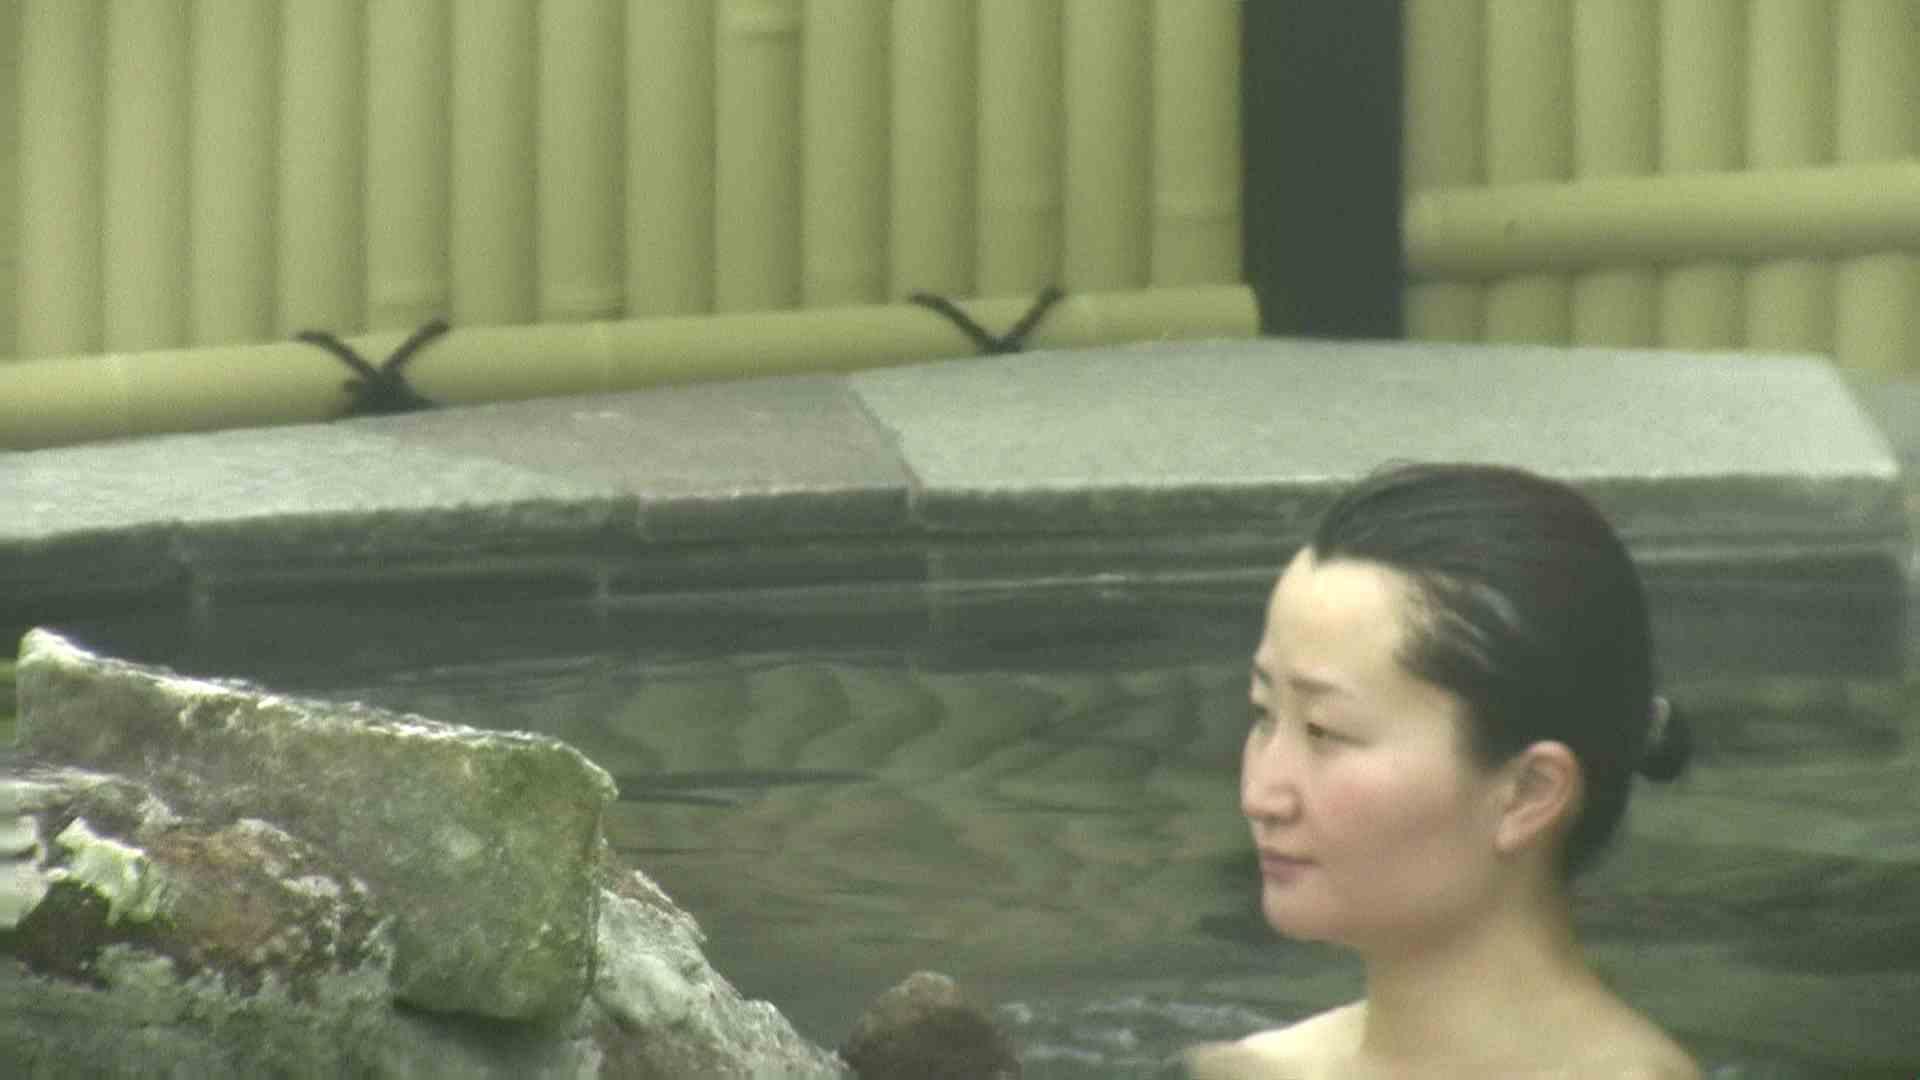 Aquaな露天風呂Vol.632 盗撮 | OLエロ画像  41PICs 13